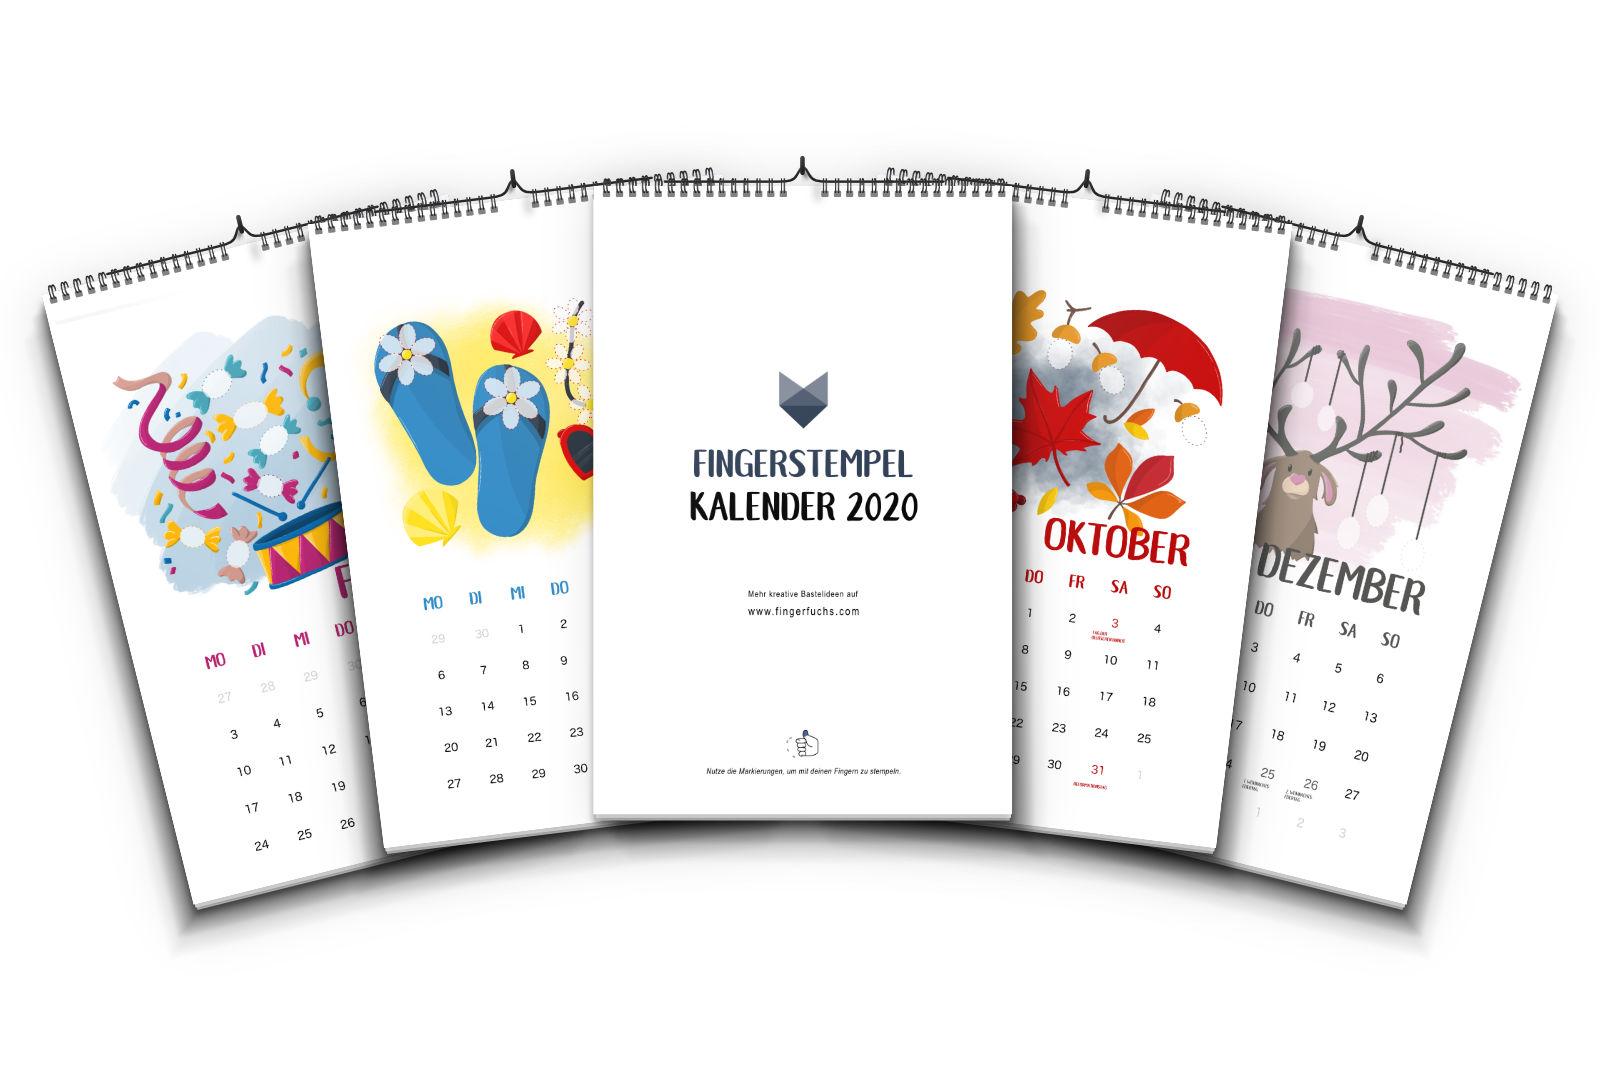 Fingerstempel-Kalender 2020